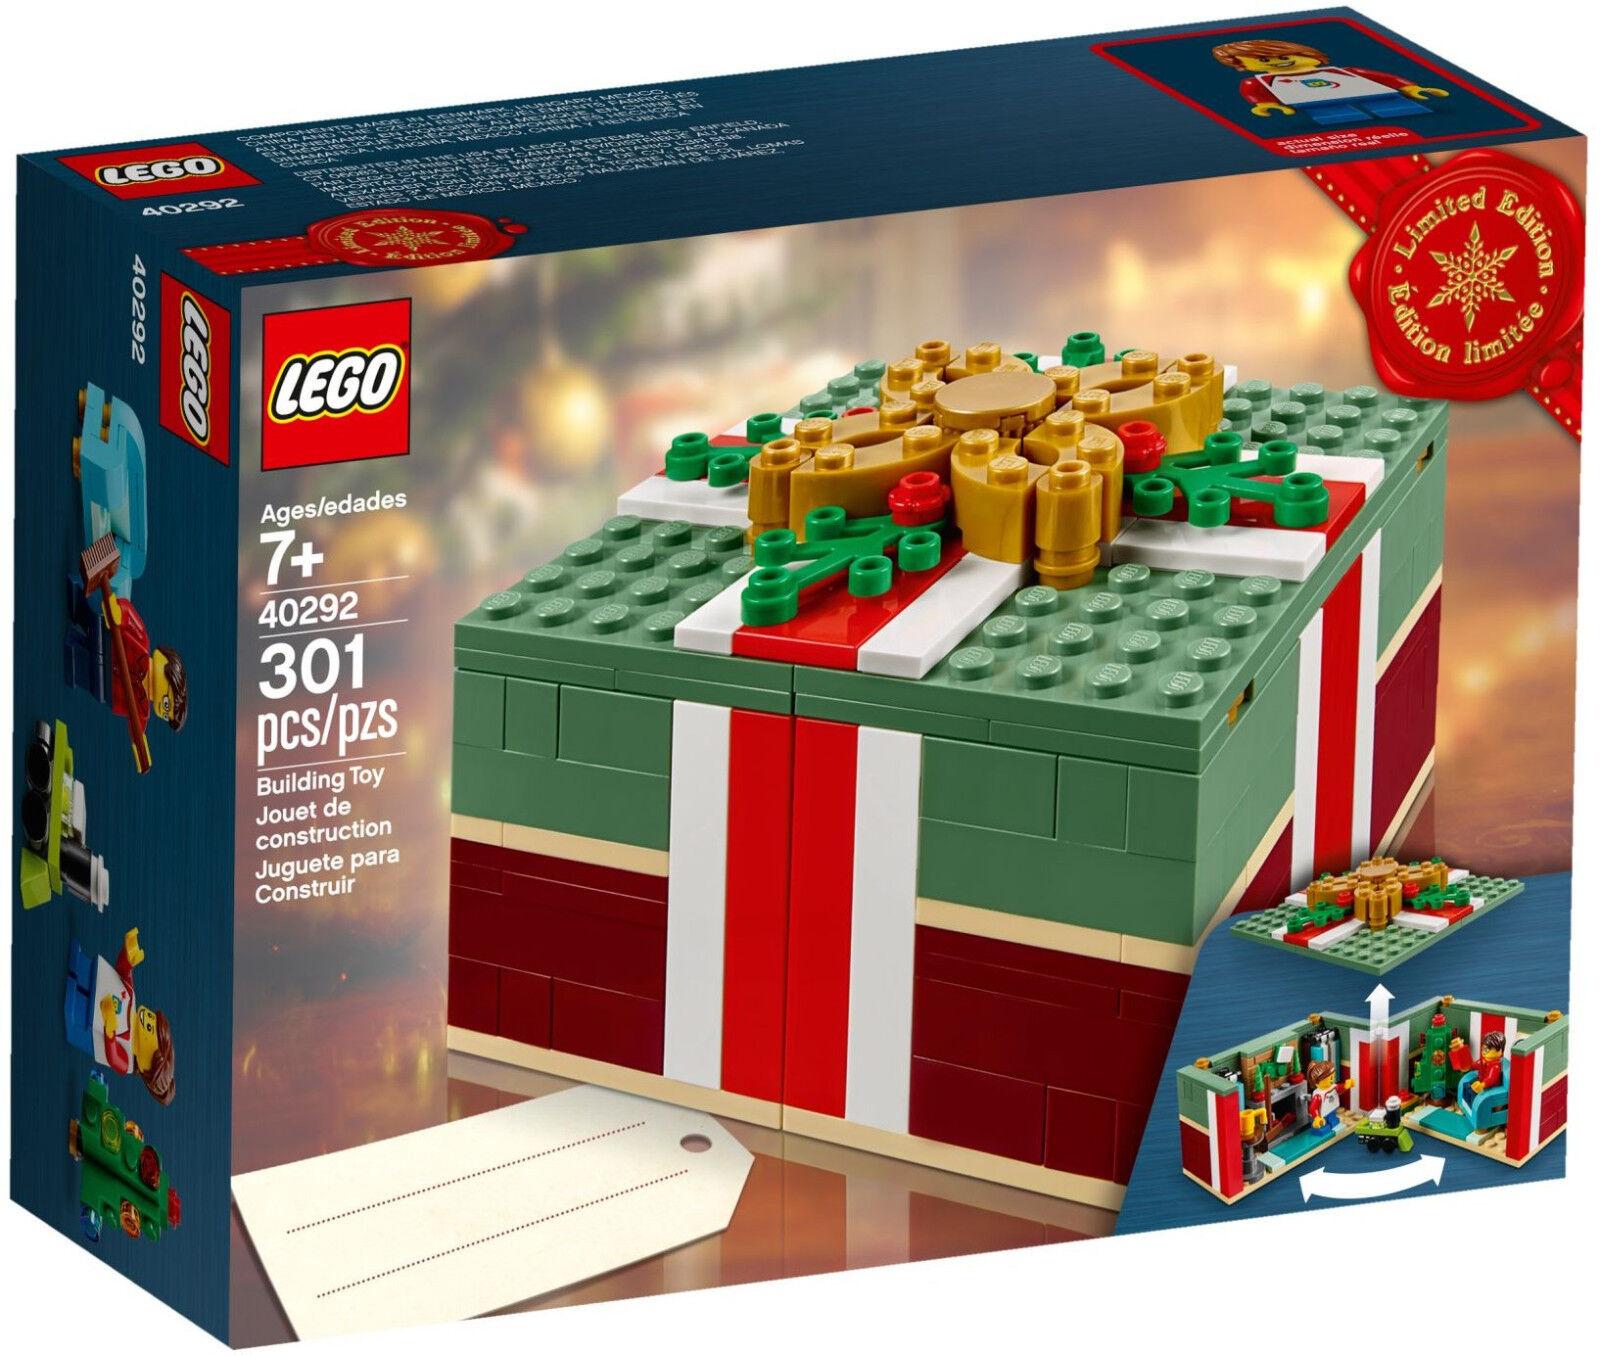 LEGO Seasonal - 40292 Christmas Gift box cadeau de noël-Neuf & neuf dans sa boîte